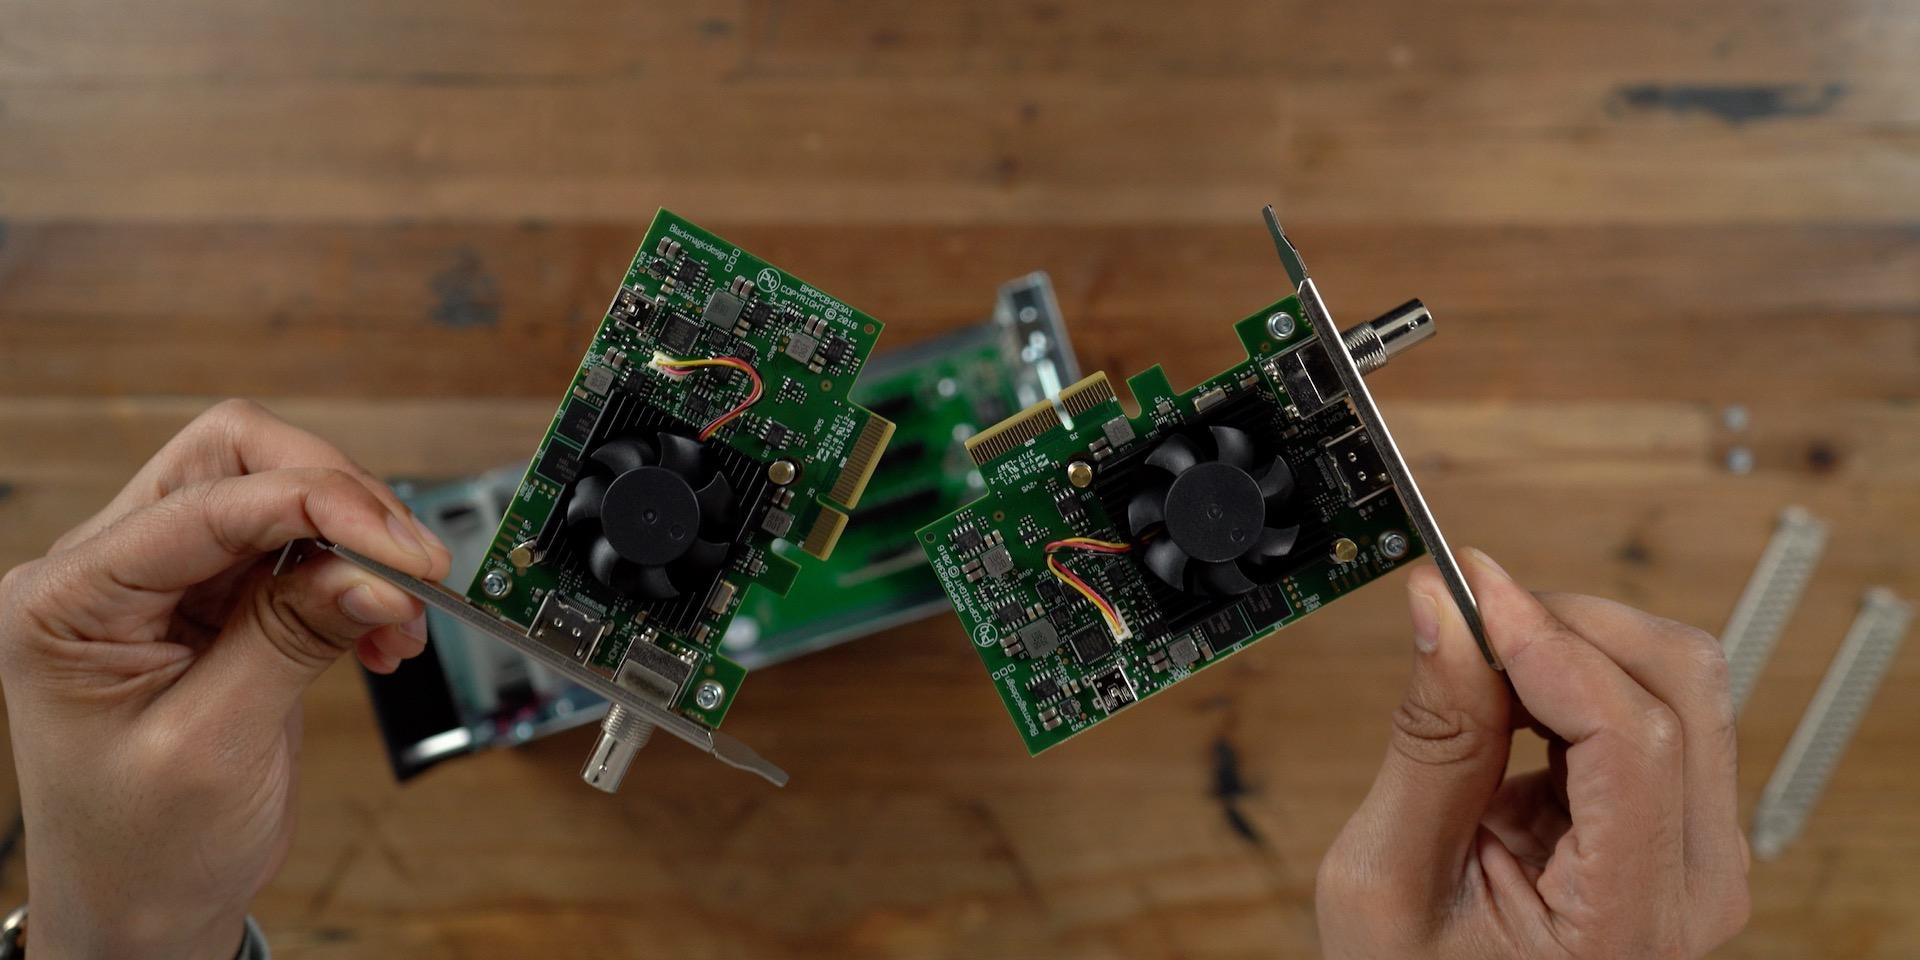 Blackmagic DeckLink Mini Recorder 4K PCIe Expansion Cards